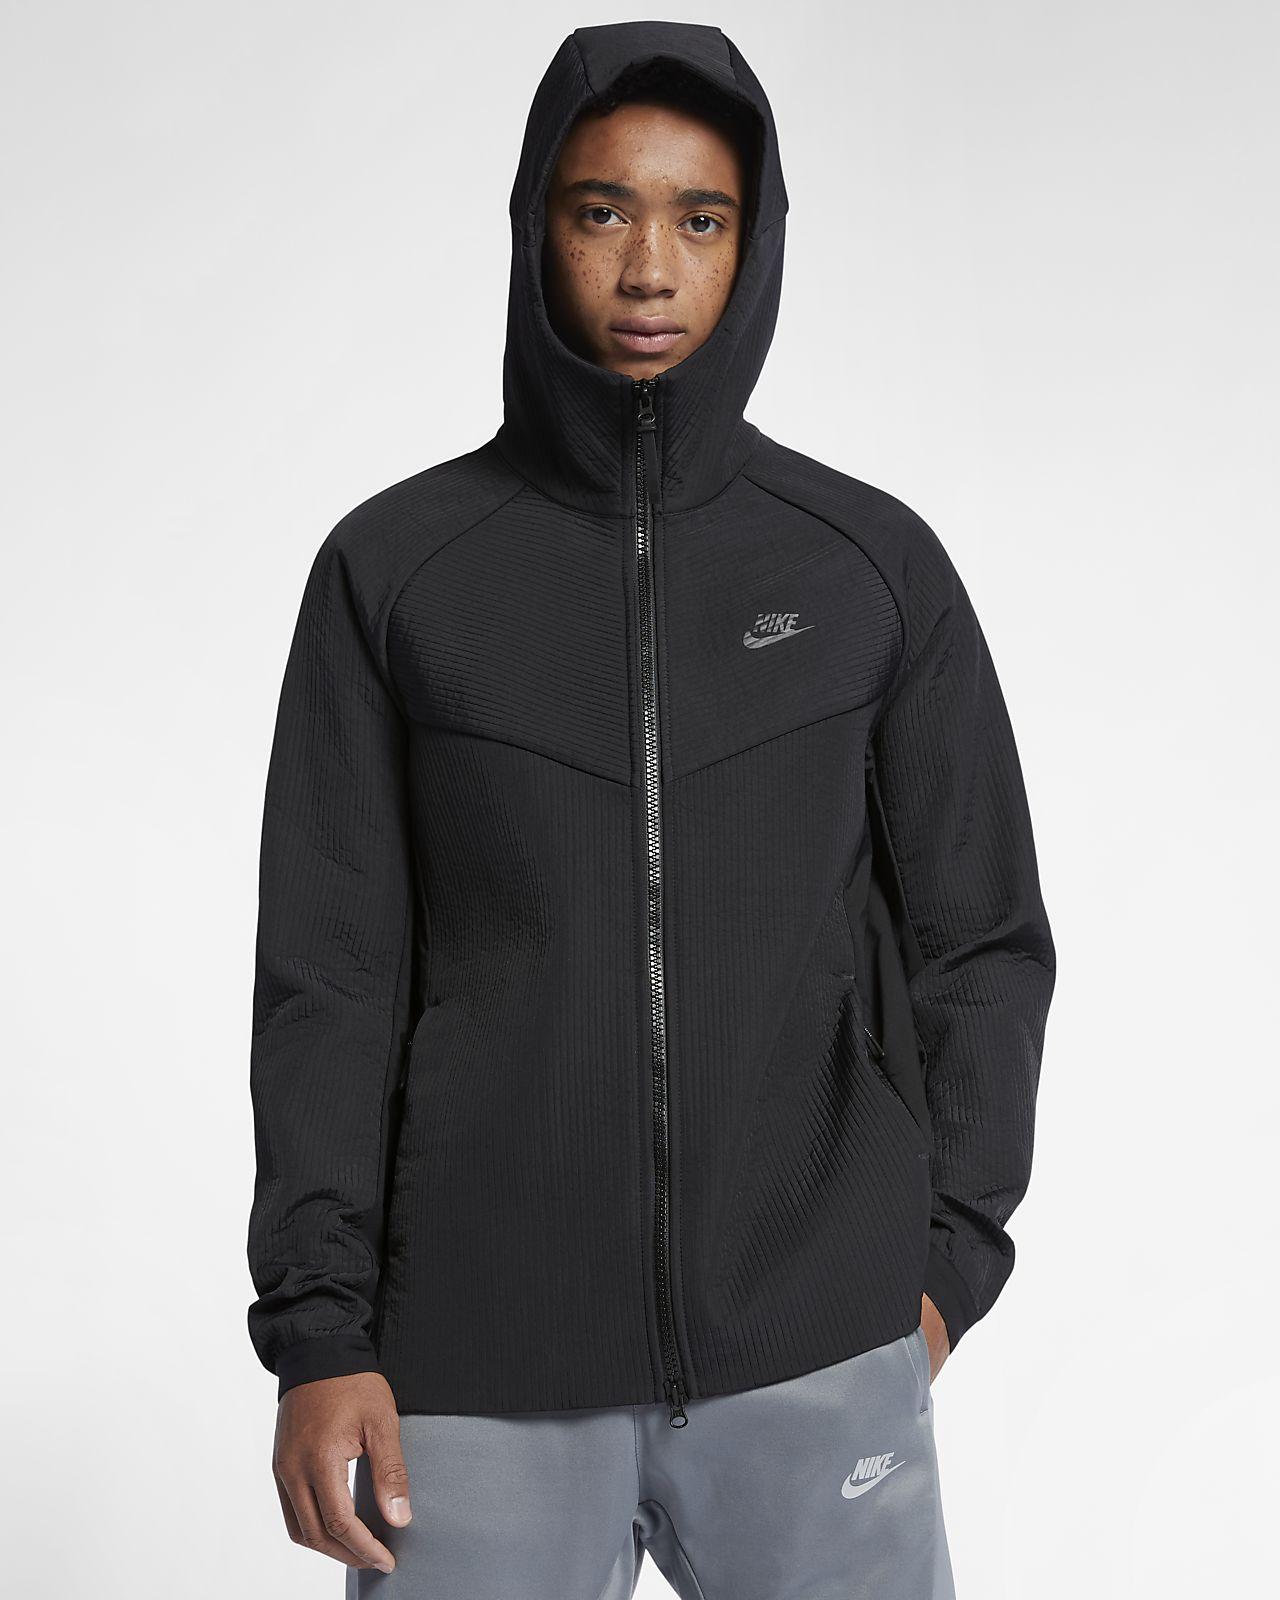 35a4e737a Giacca woven Nike Sportswear Tech Pack - Uomo. Nike.com IT